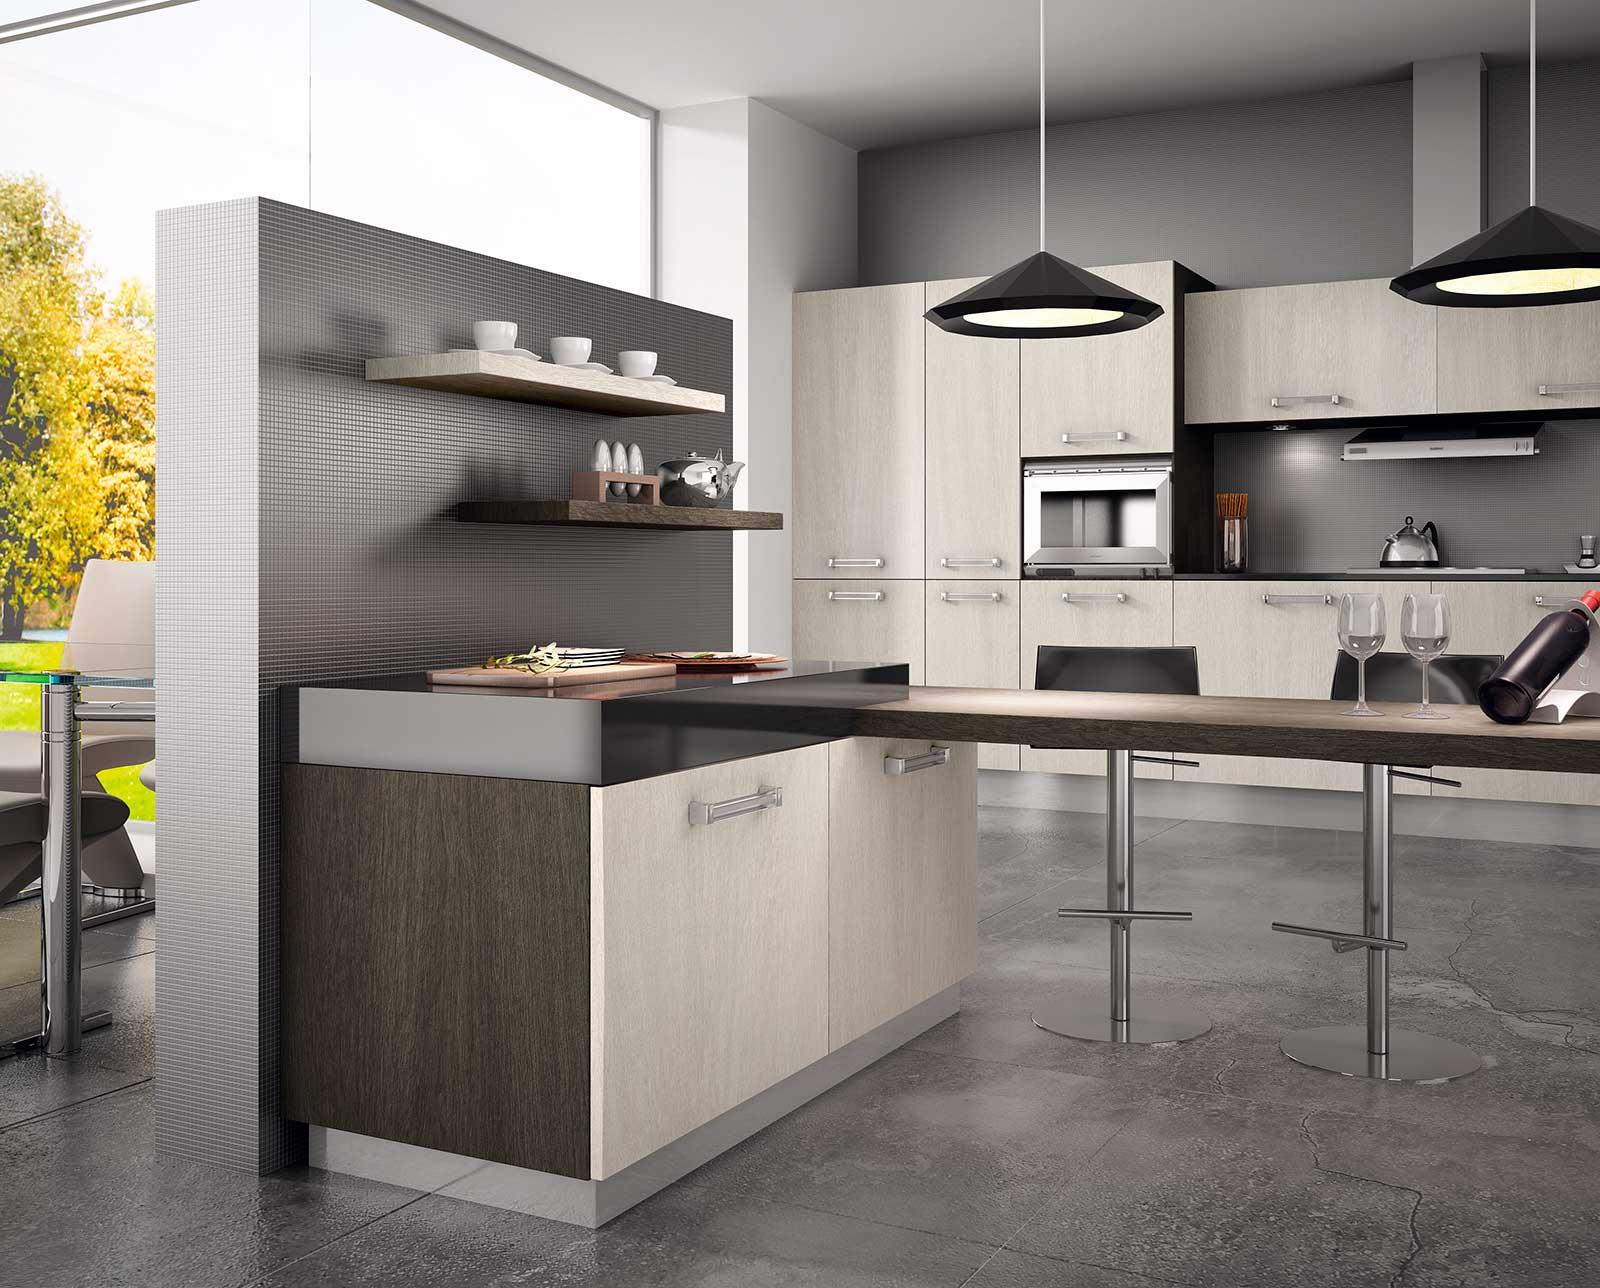 Cocina 03 cocinas capis dise o y fabricaci n de cocinas for Configurador de cocinas